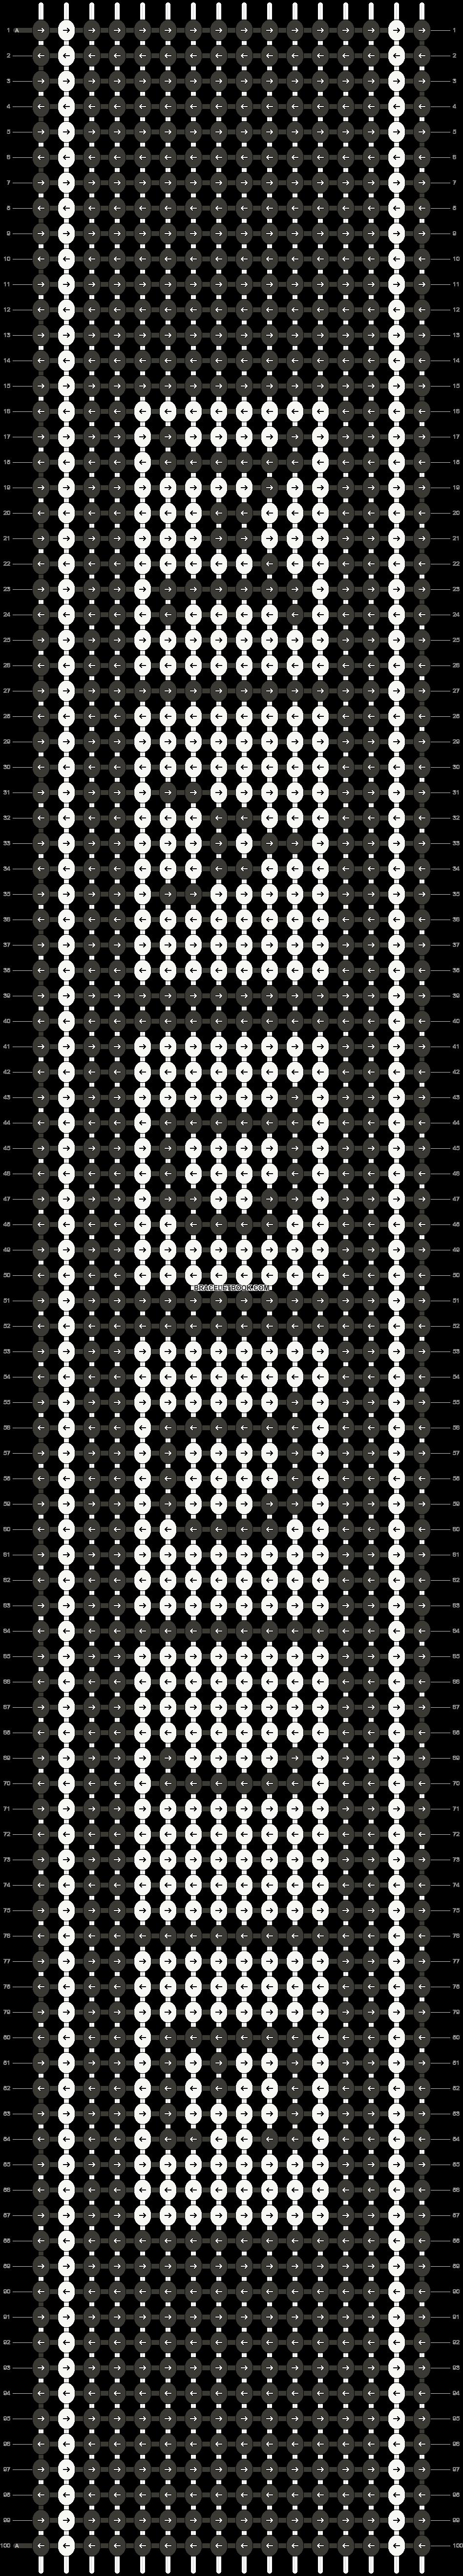 Alpha pattern #3555 pattern